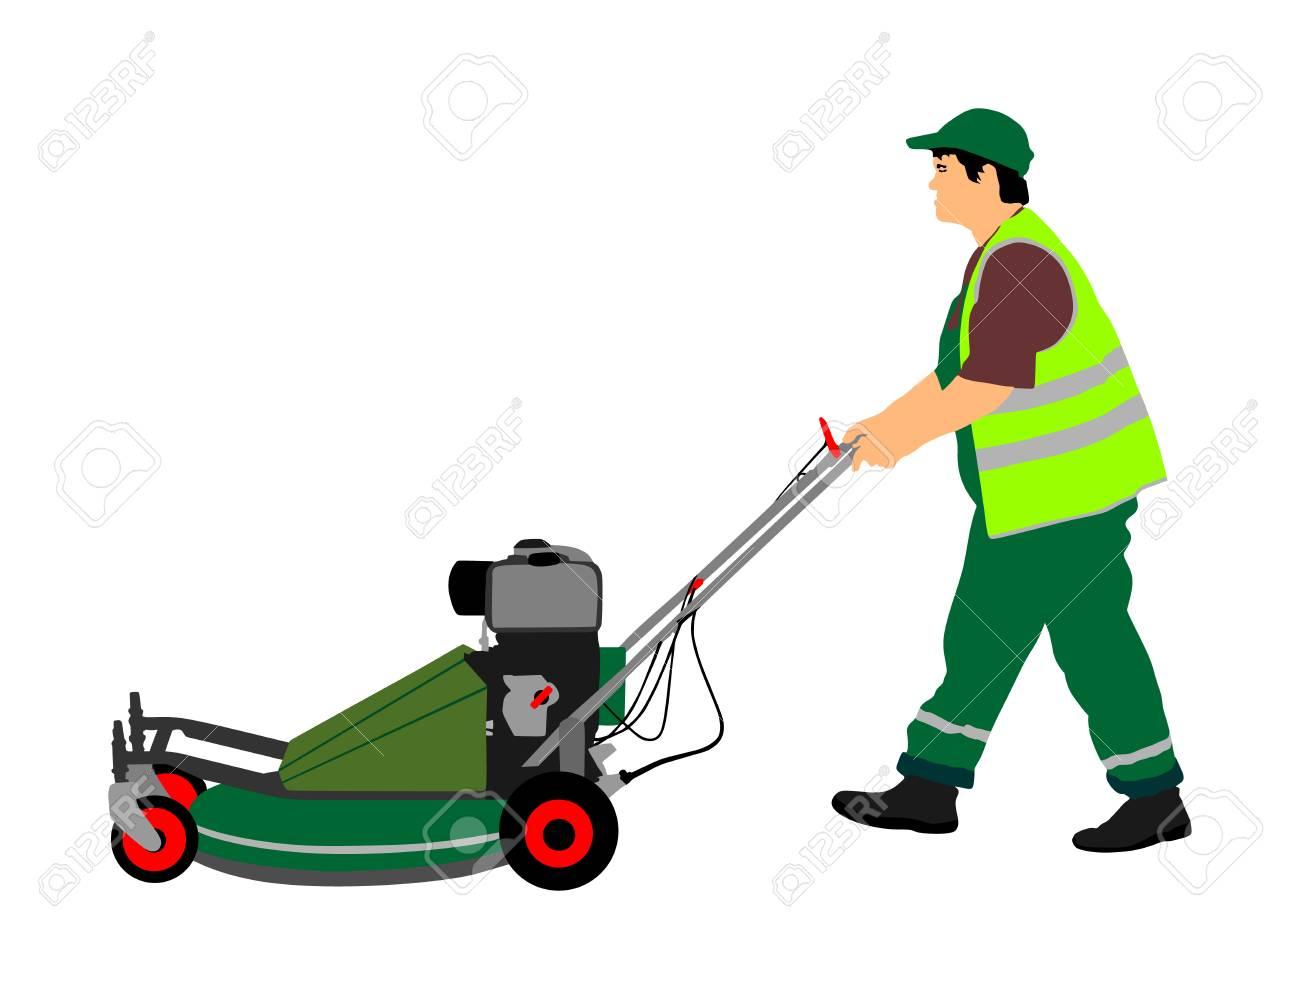 Gardener man mowing lawn mower vector illustration. Grass trimmer cutting. Professional garden worker. - 97334013